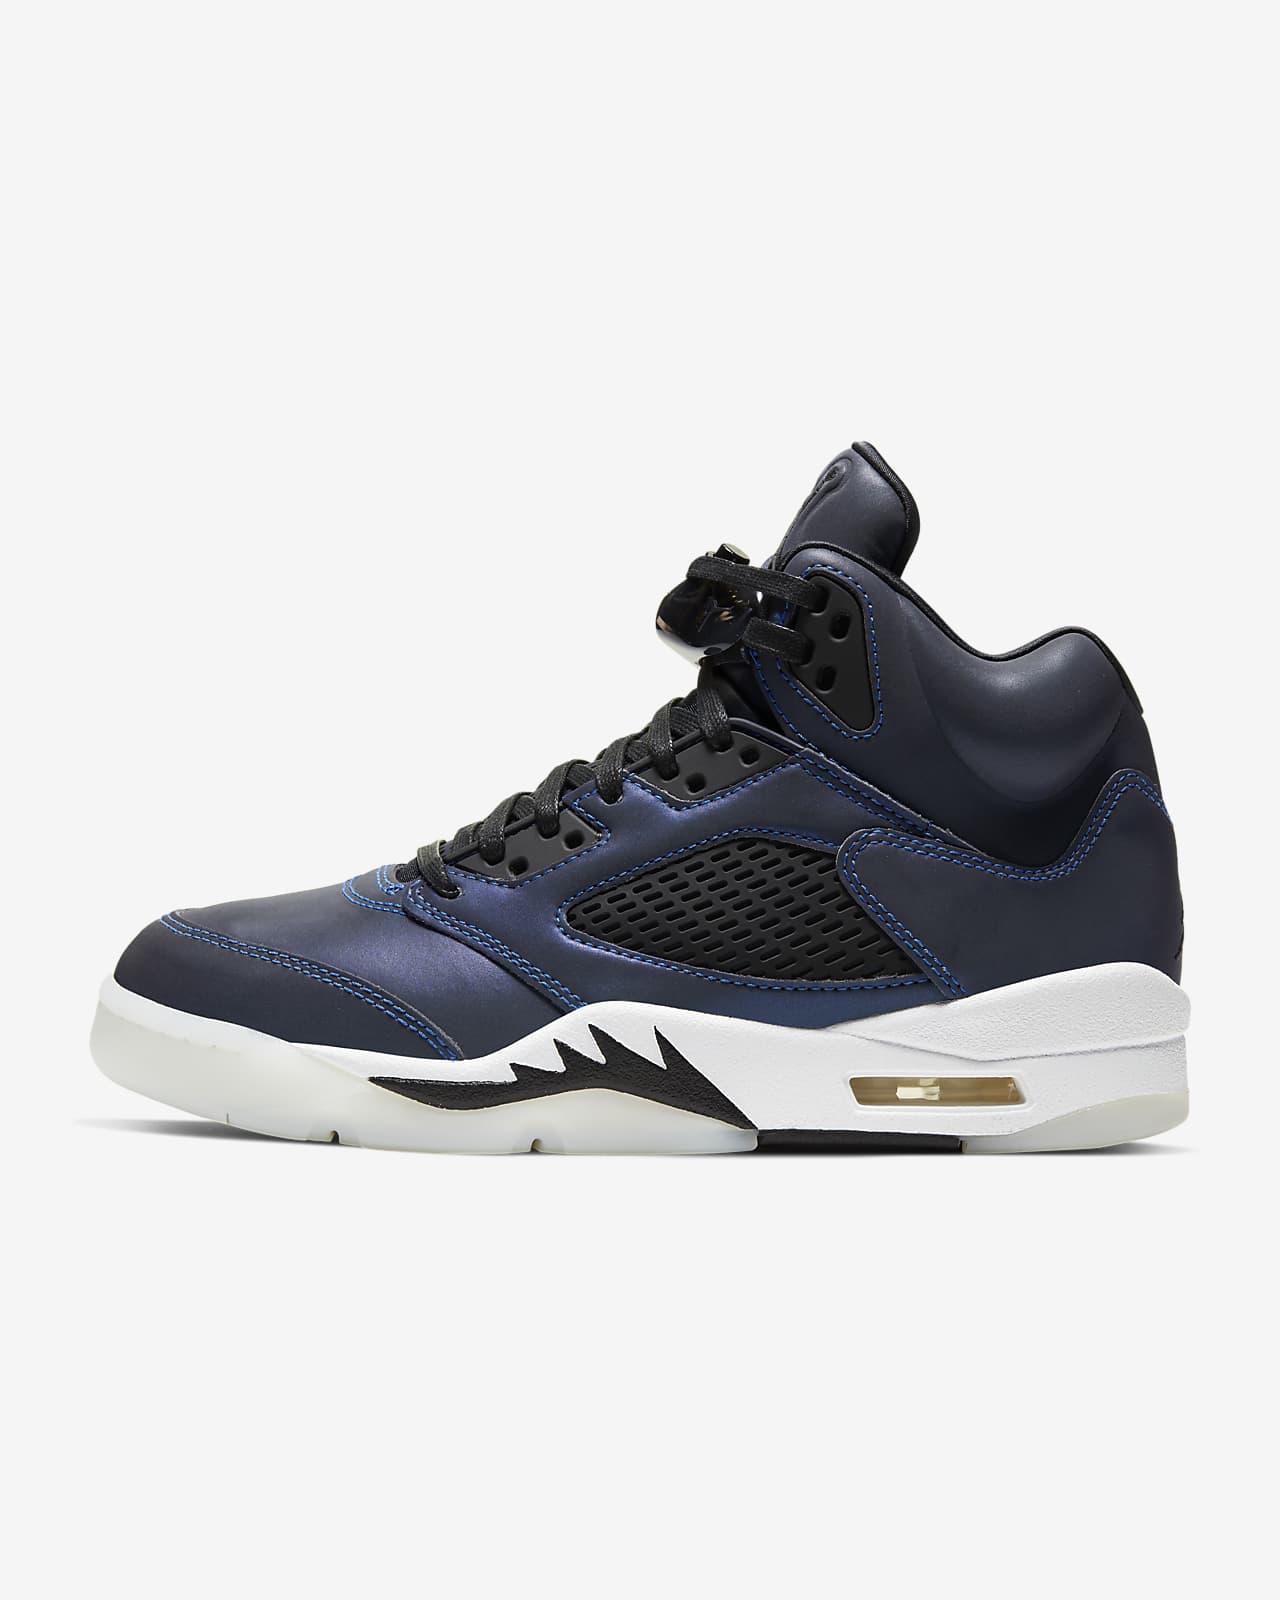 Air Jordan 5 Retro Women's Shoes